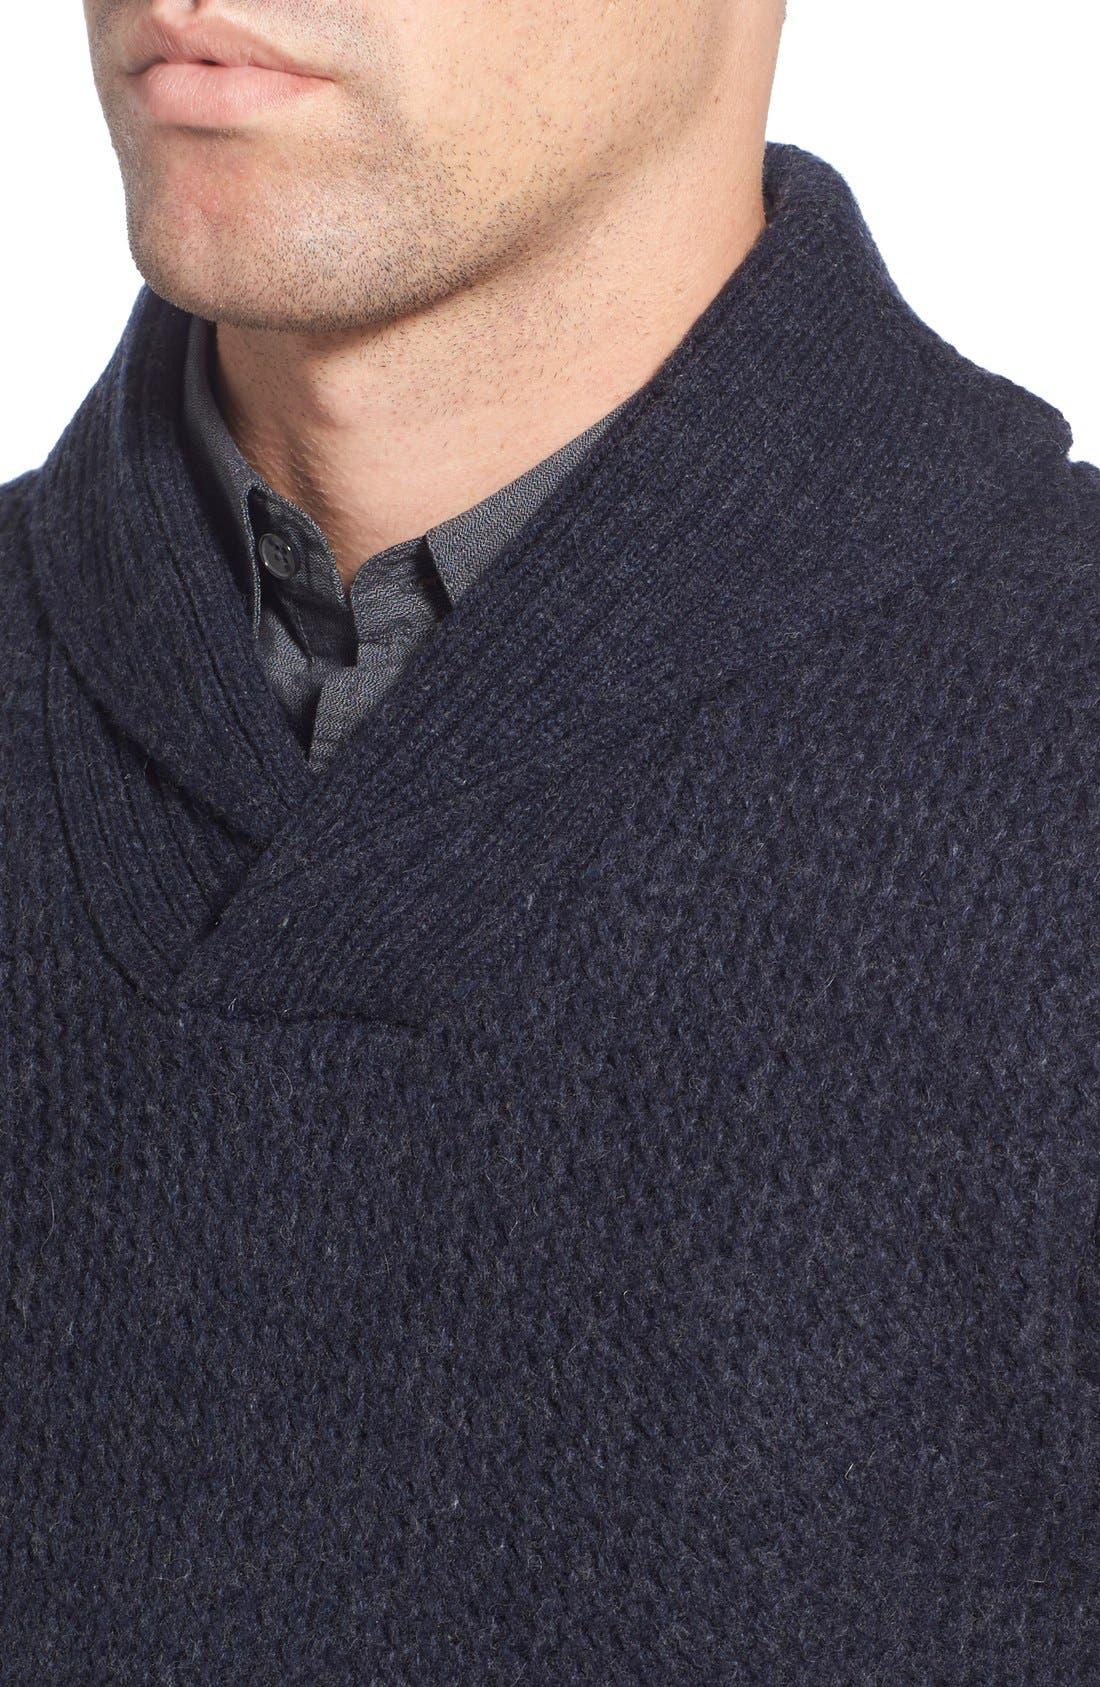 Regular Fit Shawl Collar Sweater,                             Alternate thumbnail 8, color,